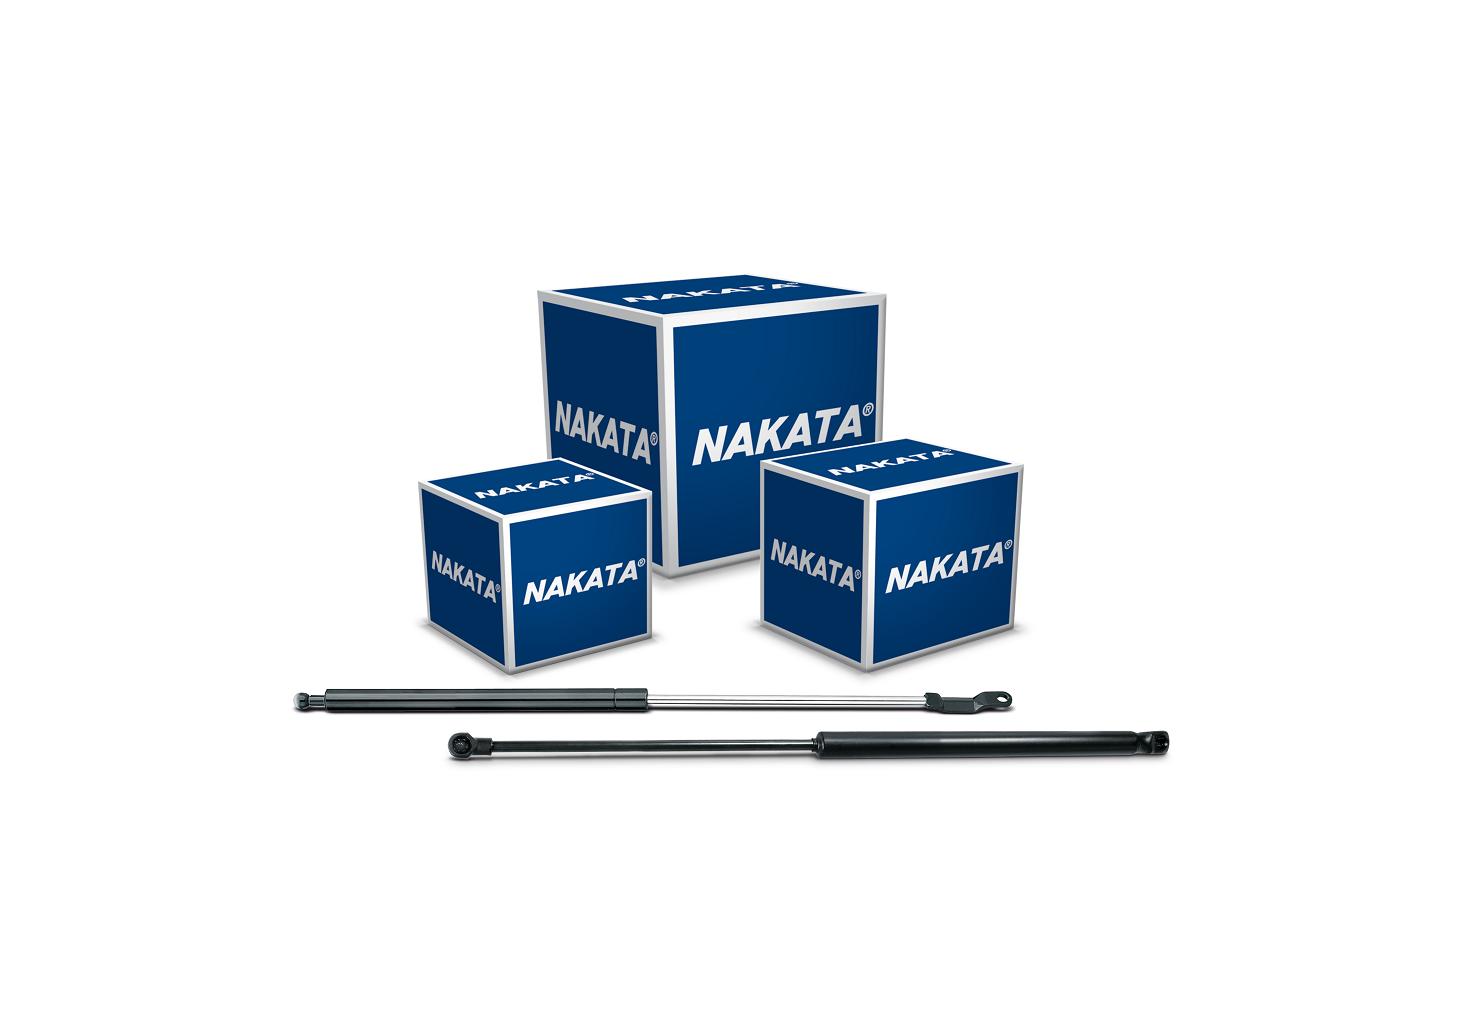 Nakata lança amortecedores mola a gás para 18 veículos de várias marcas